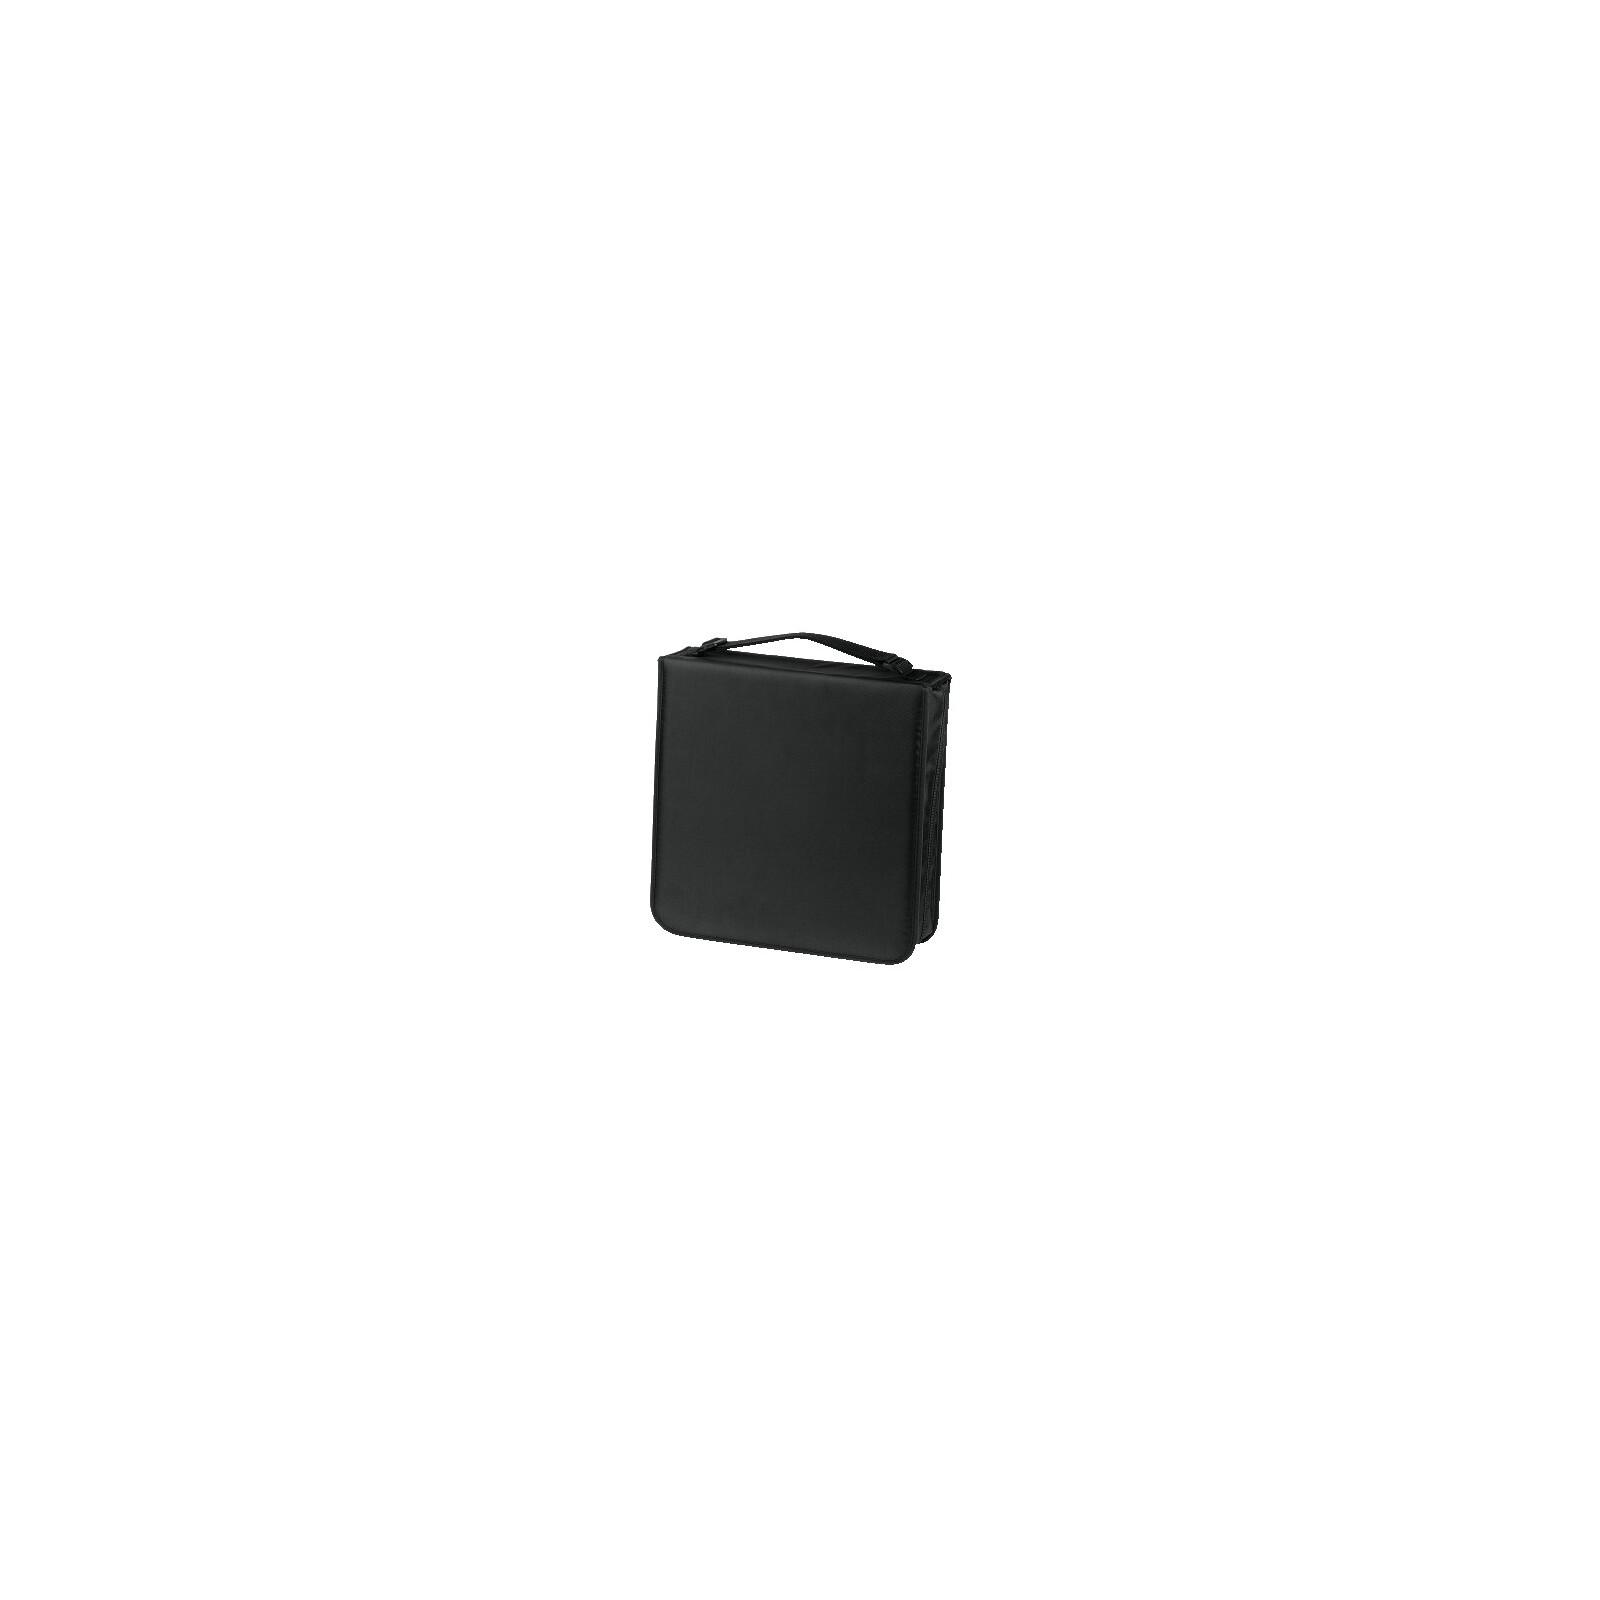 Hama 33835 CD-/DVD-/Blu-ray-Tasche 208 schwarz